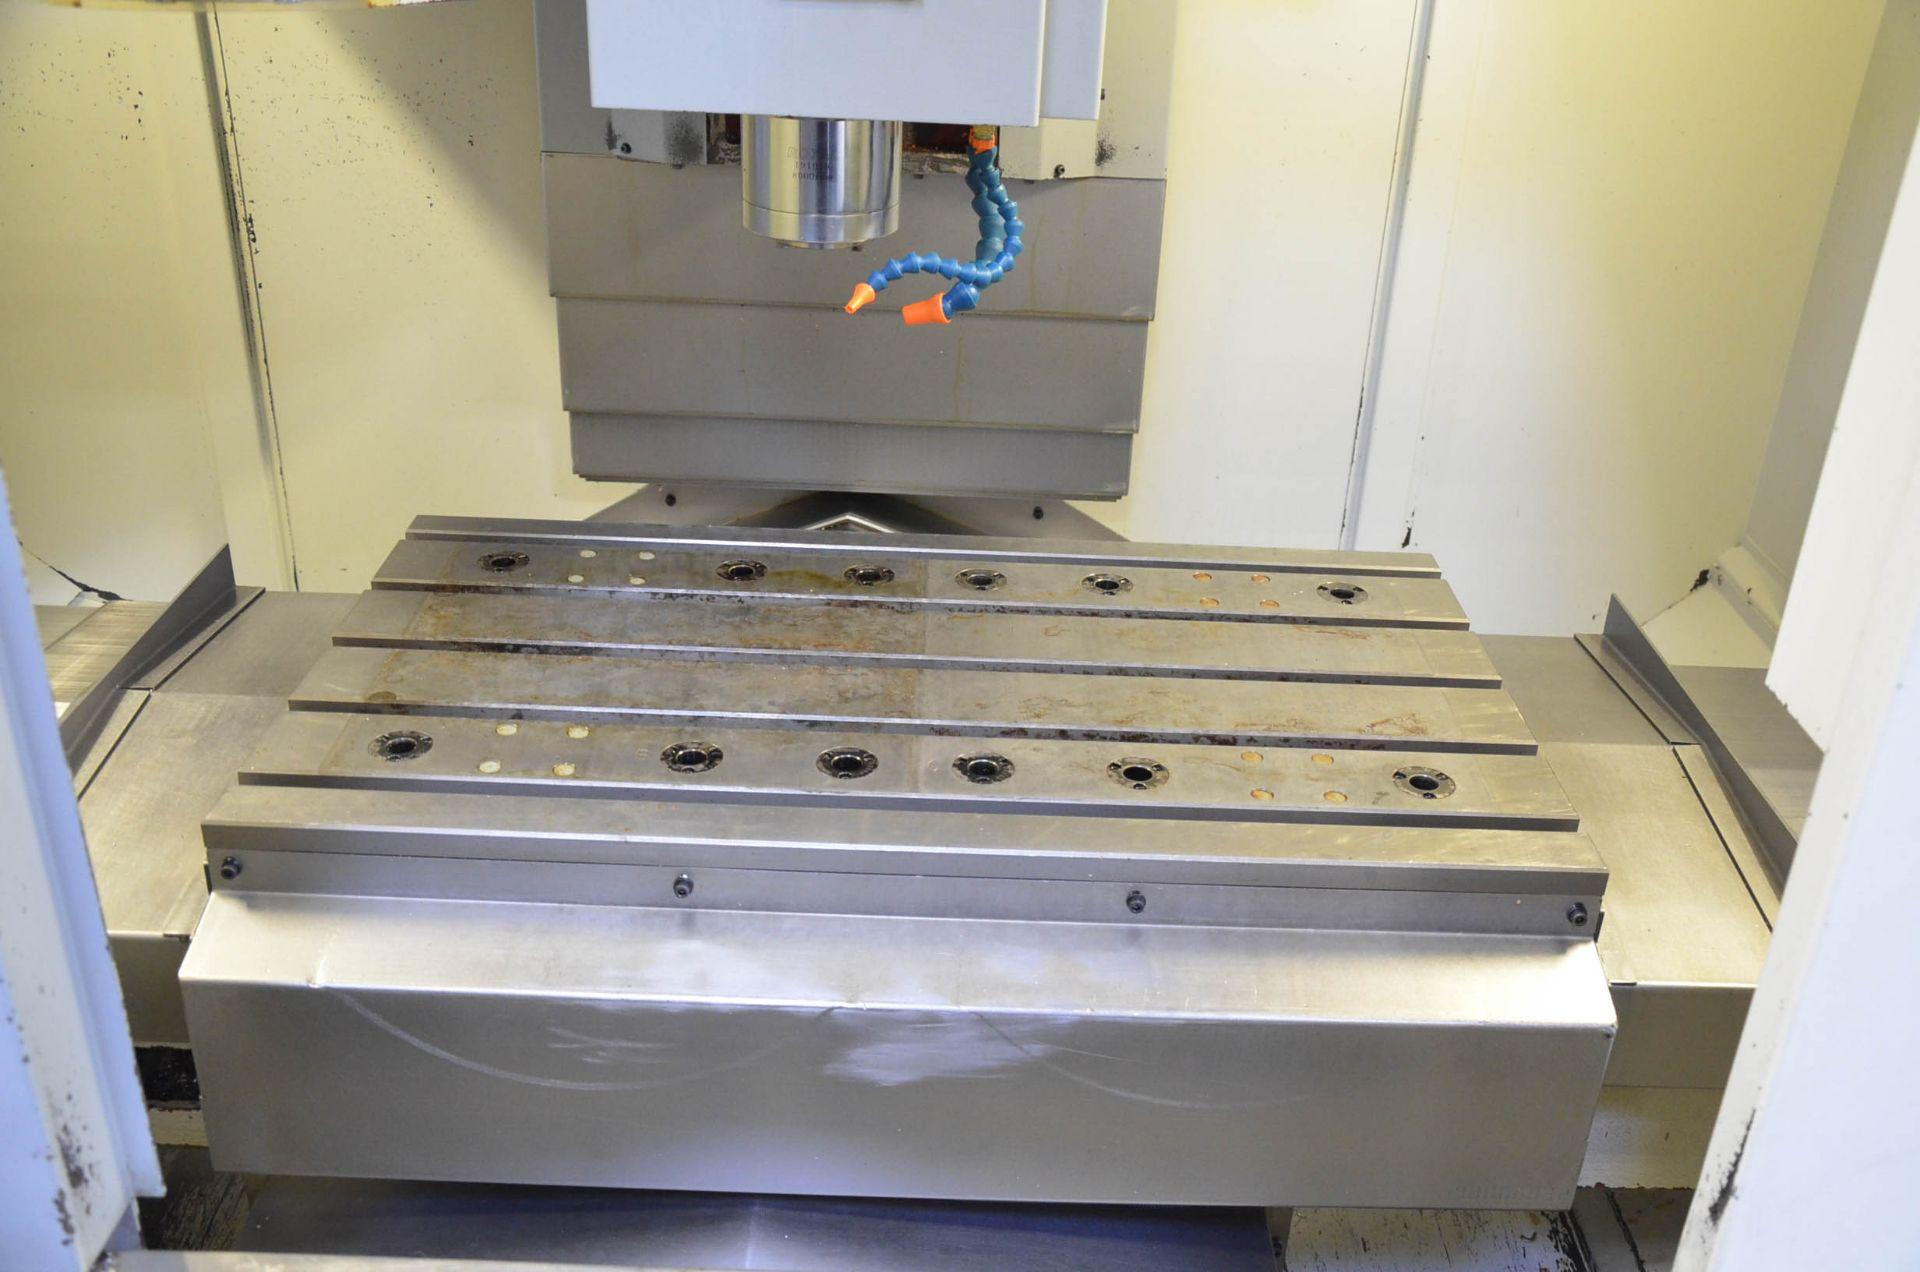 "SWI (2014) TRAK LPM CNC VERTICAL MACHINING CENTER WITH PROTO TRAK PMX CNC CONTROL, 19.5"" X 35.5"" - Image 5 of 9"